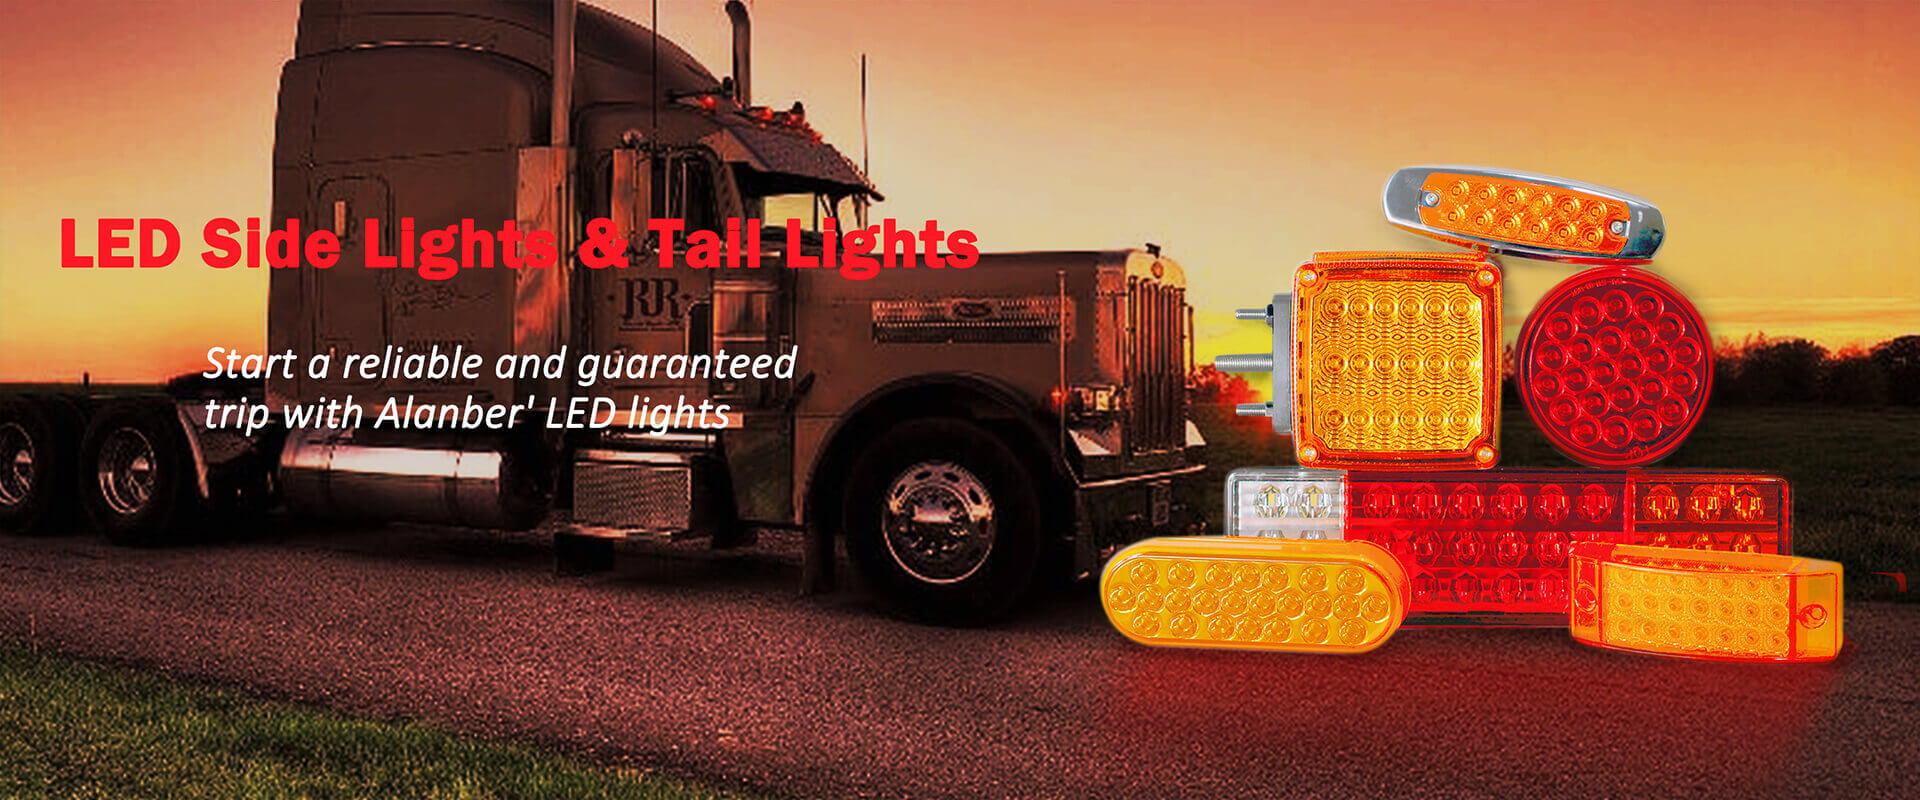 Tail Auto LightsWork Led Truck Parts jqzpMVSLUG